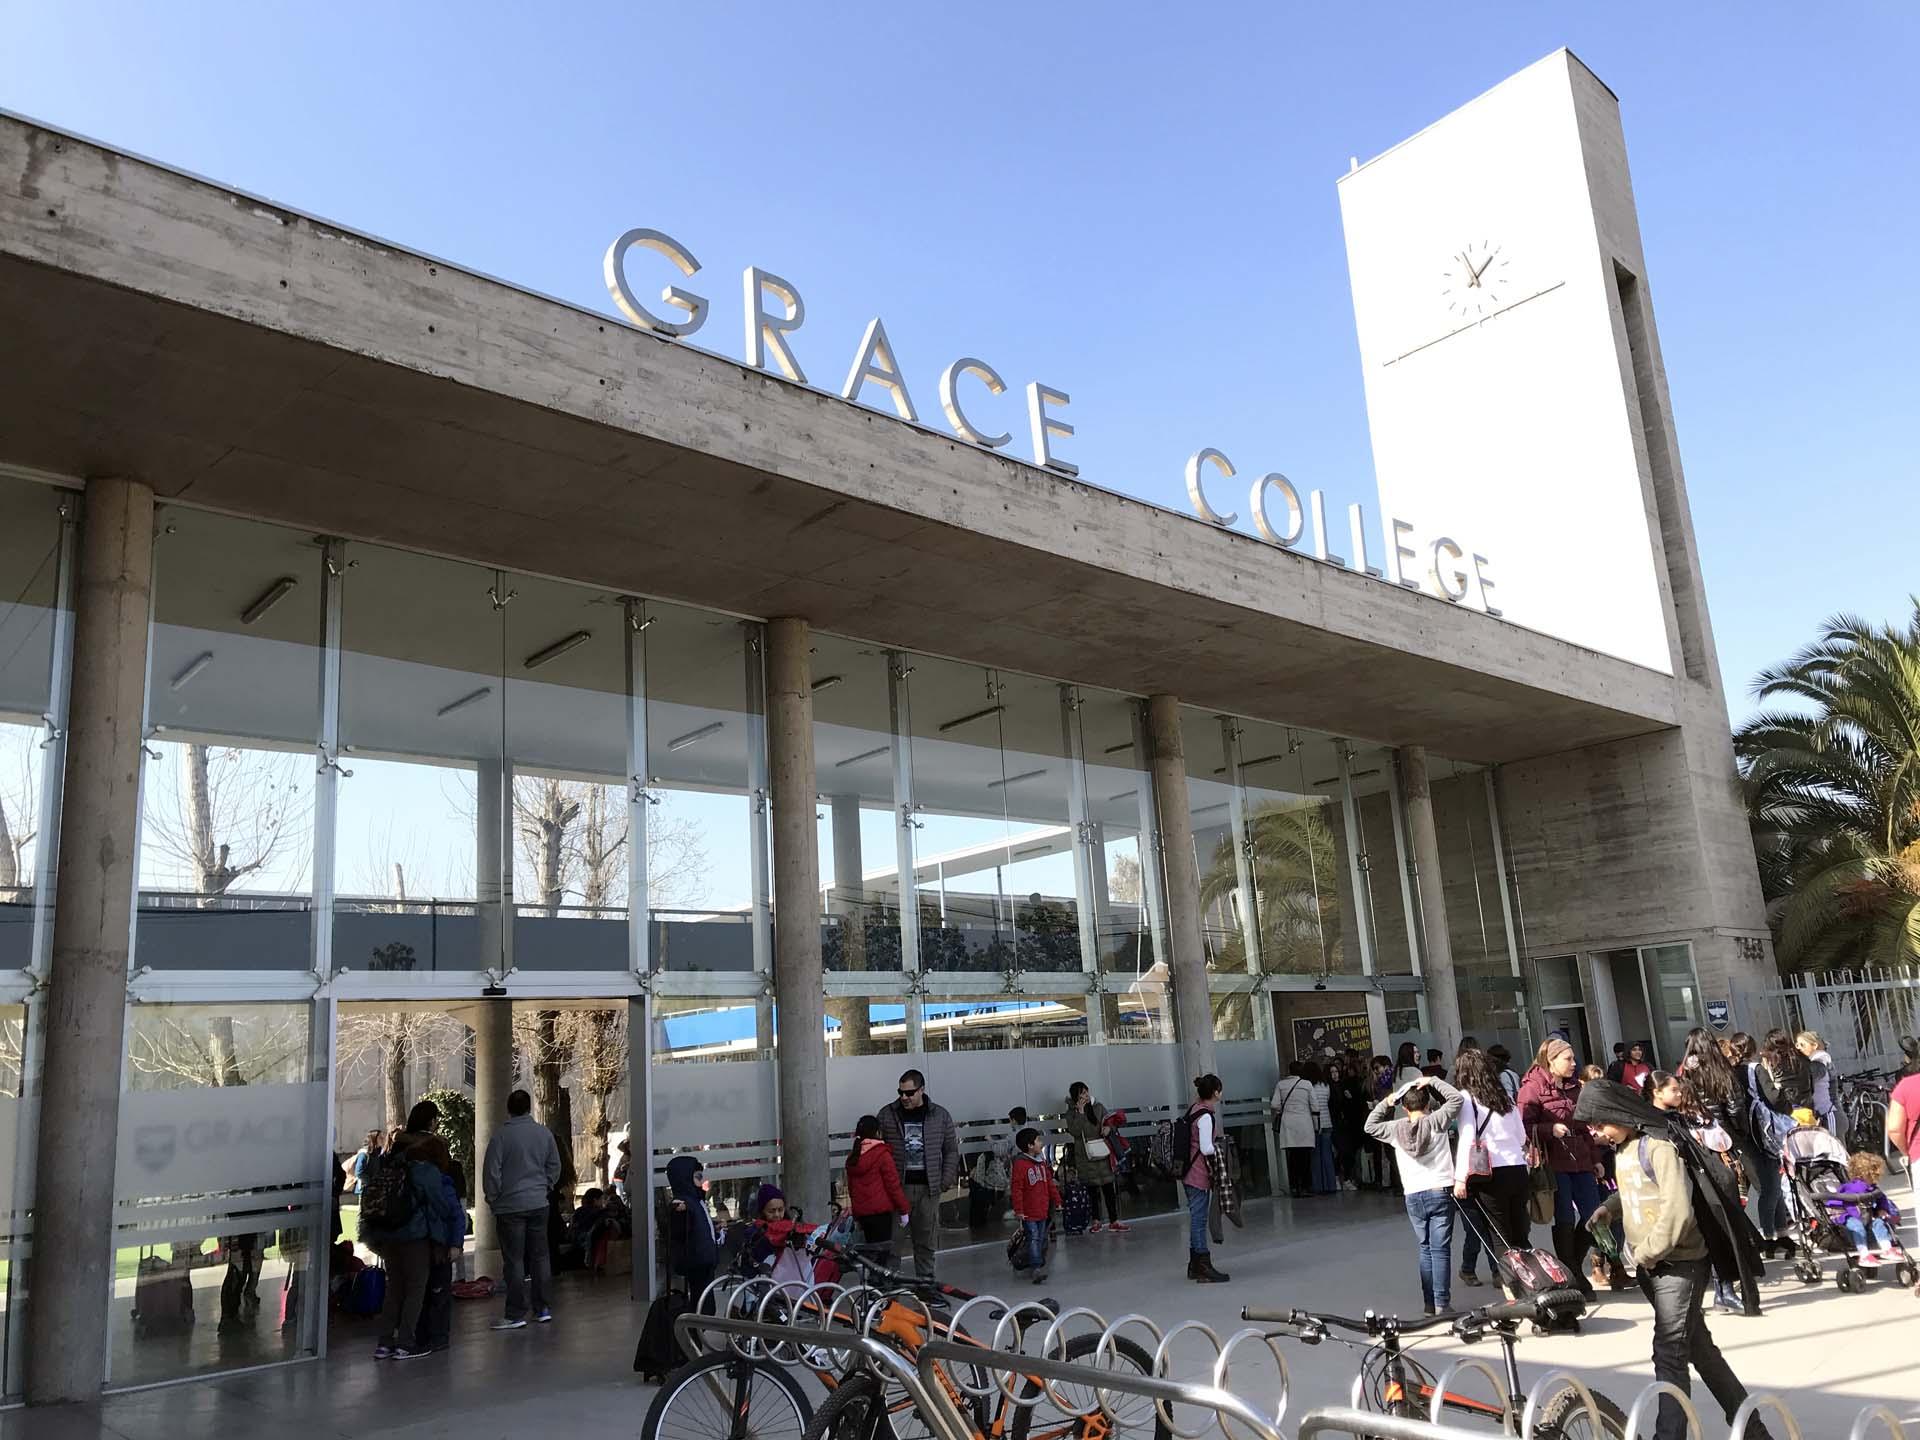 Nuevo frontis 2018 Grace College